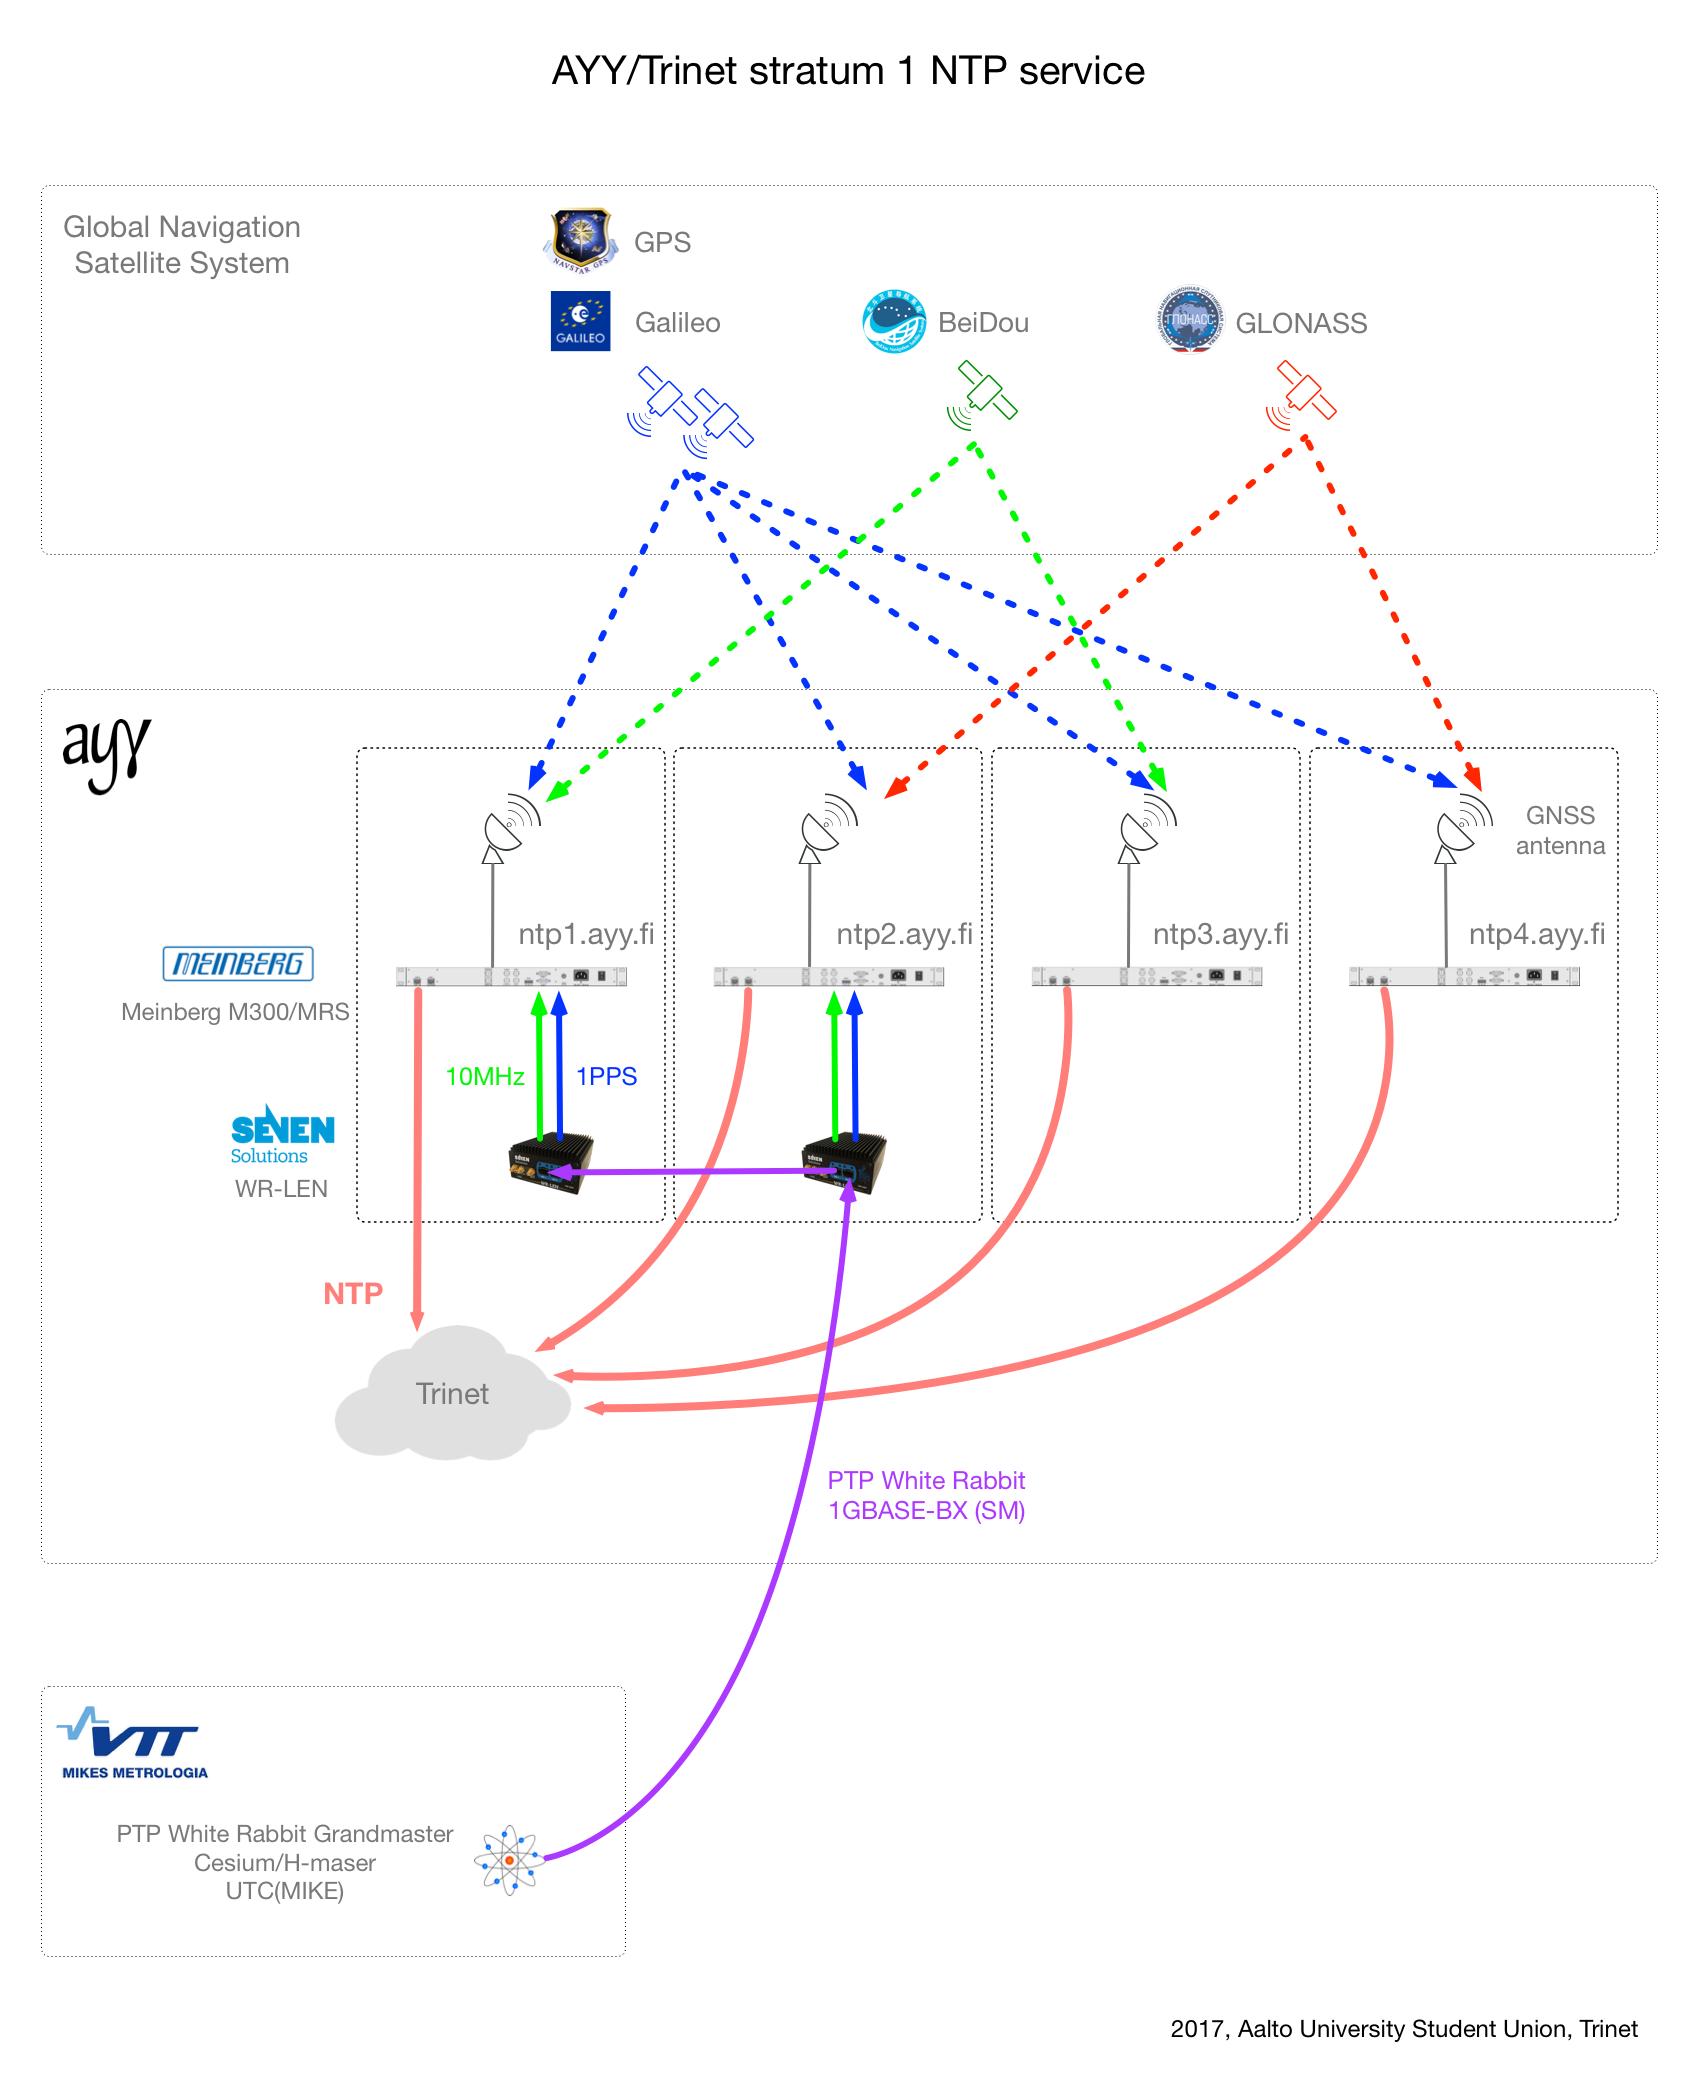 AYY Trinet Network - IP Settings